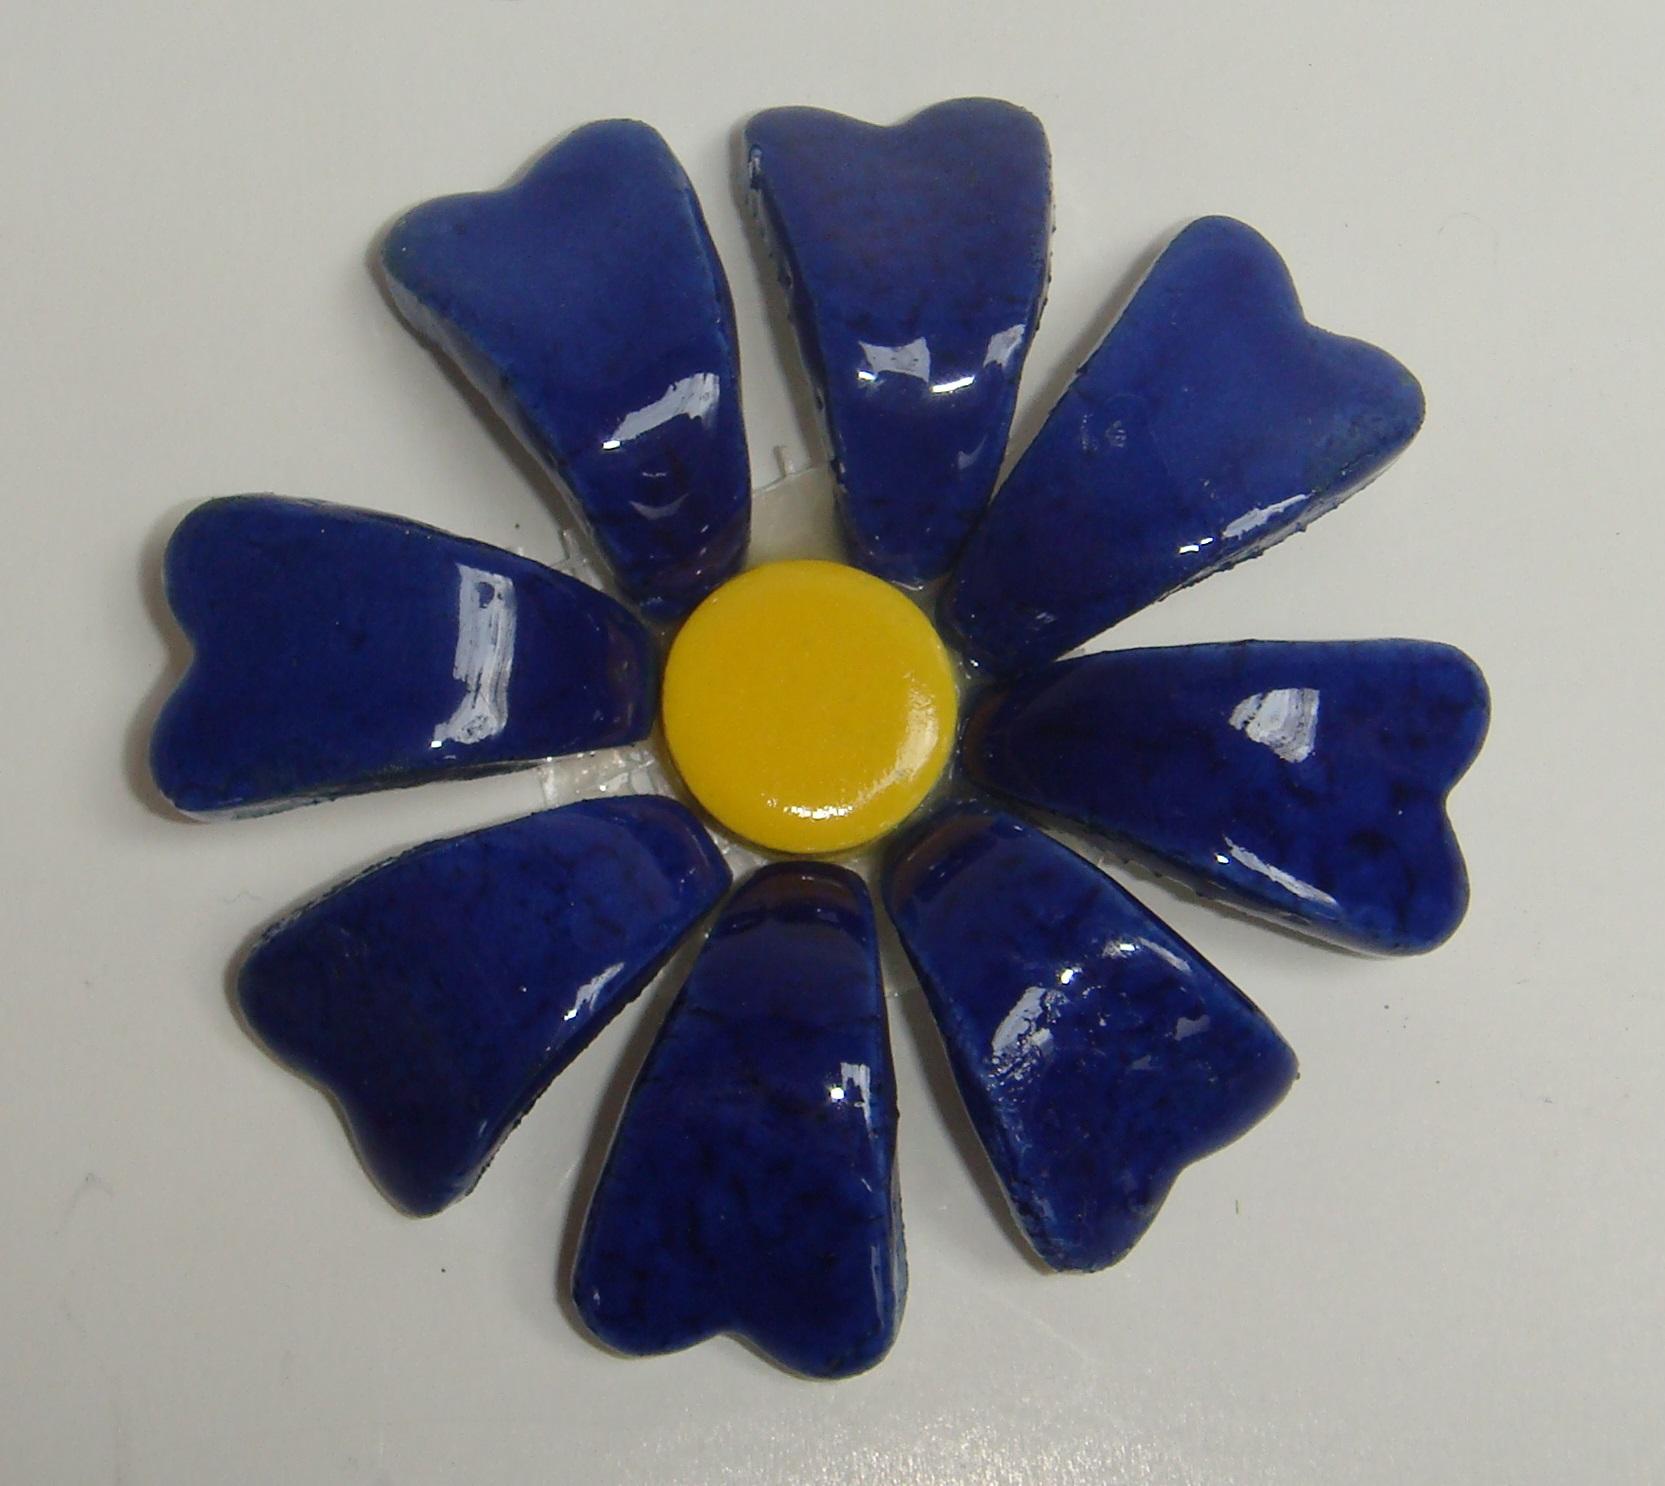 BLU-015 3D Flower Small Delft